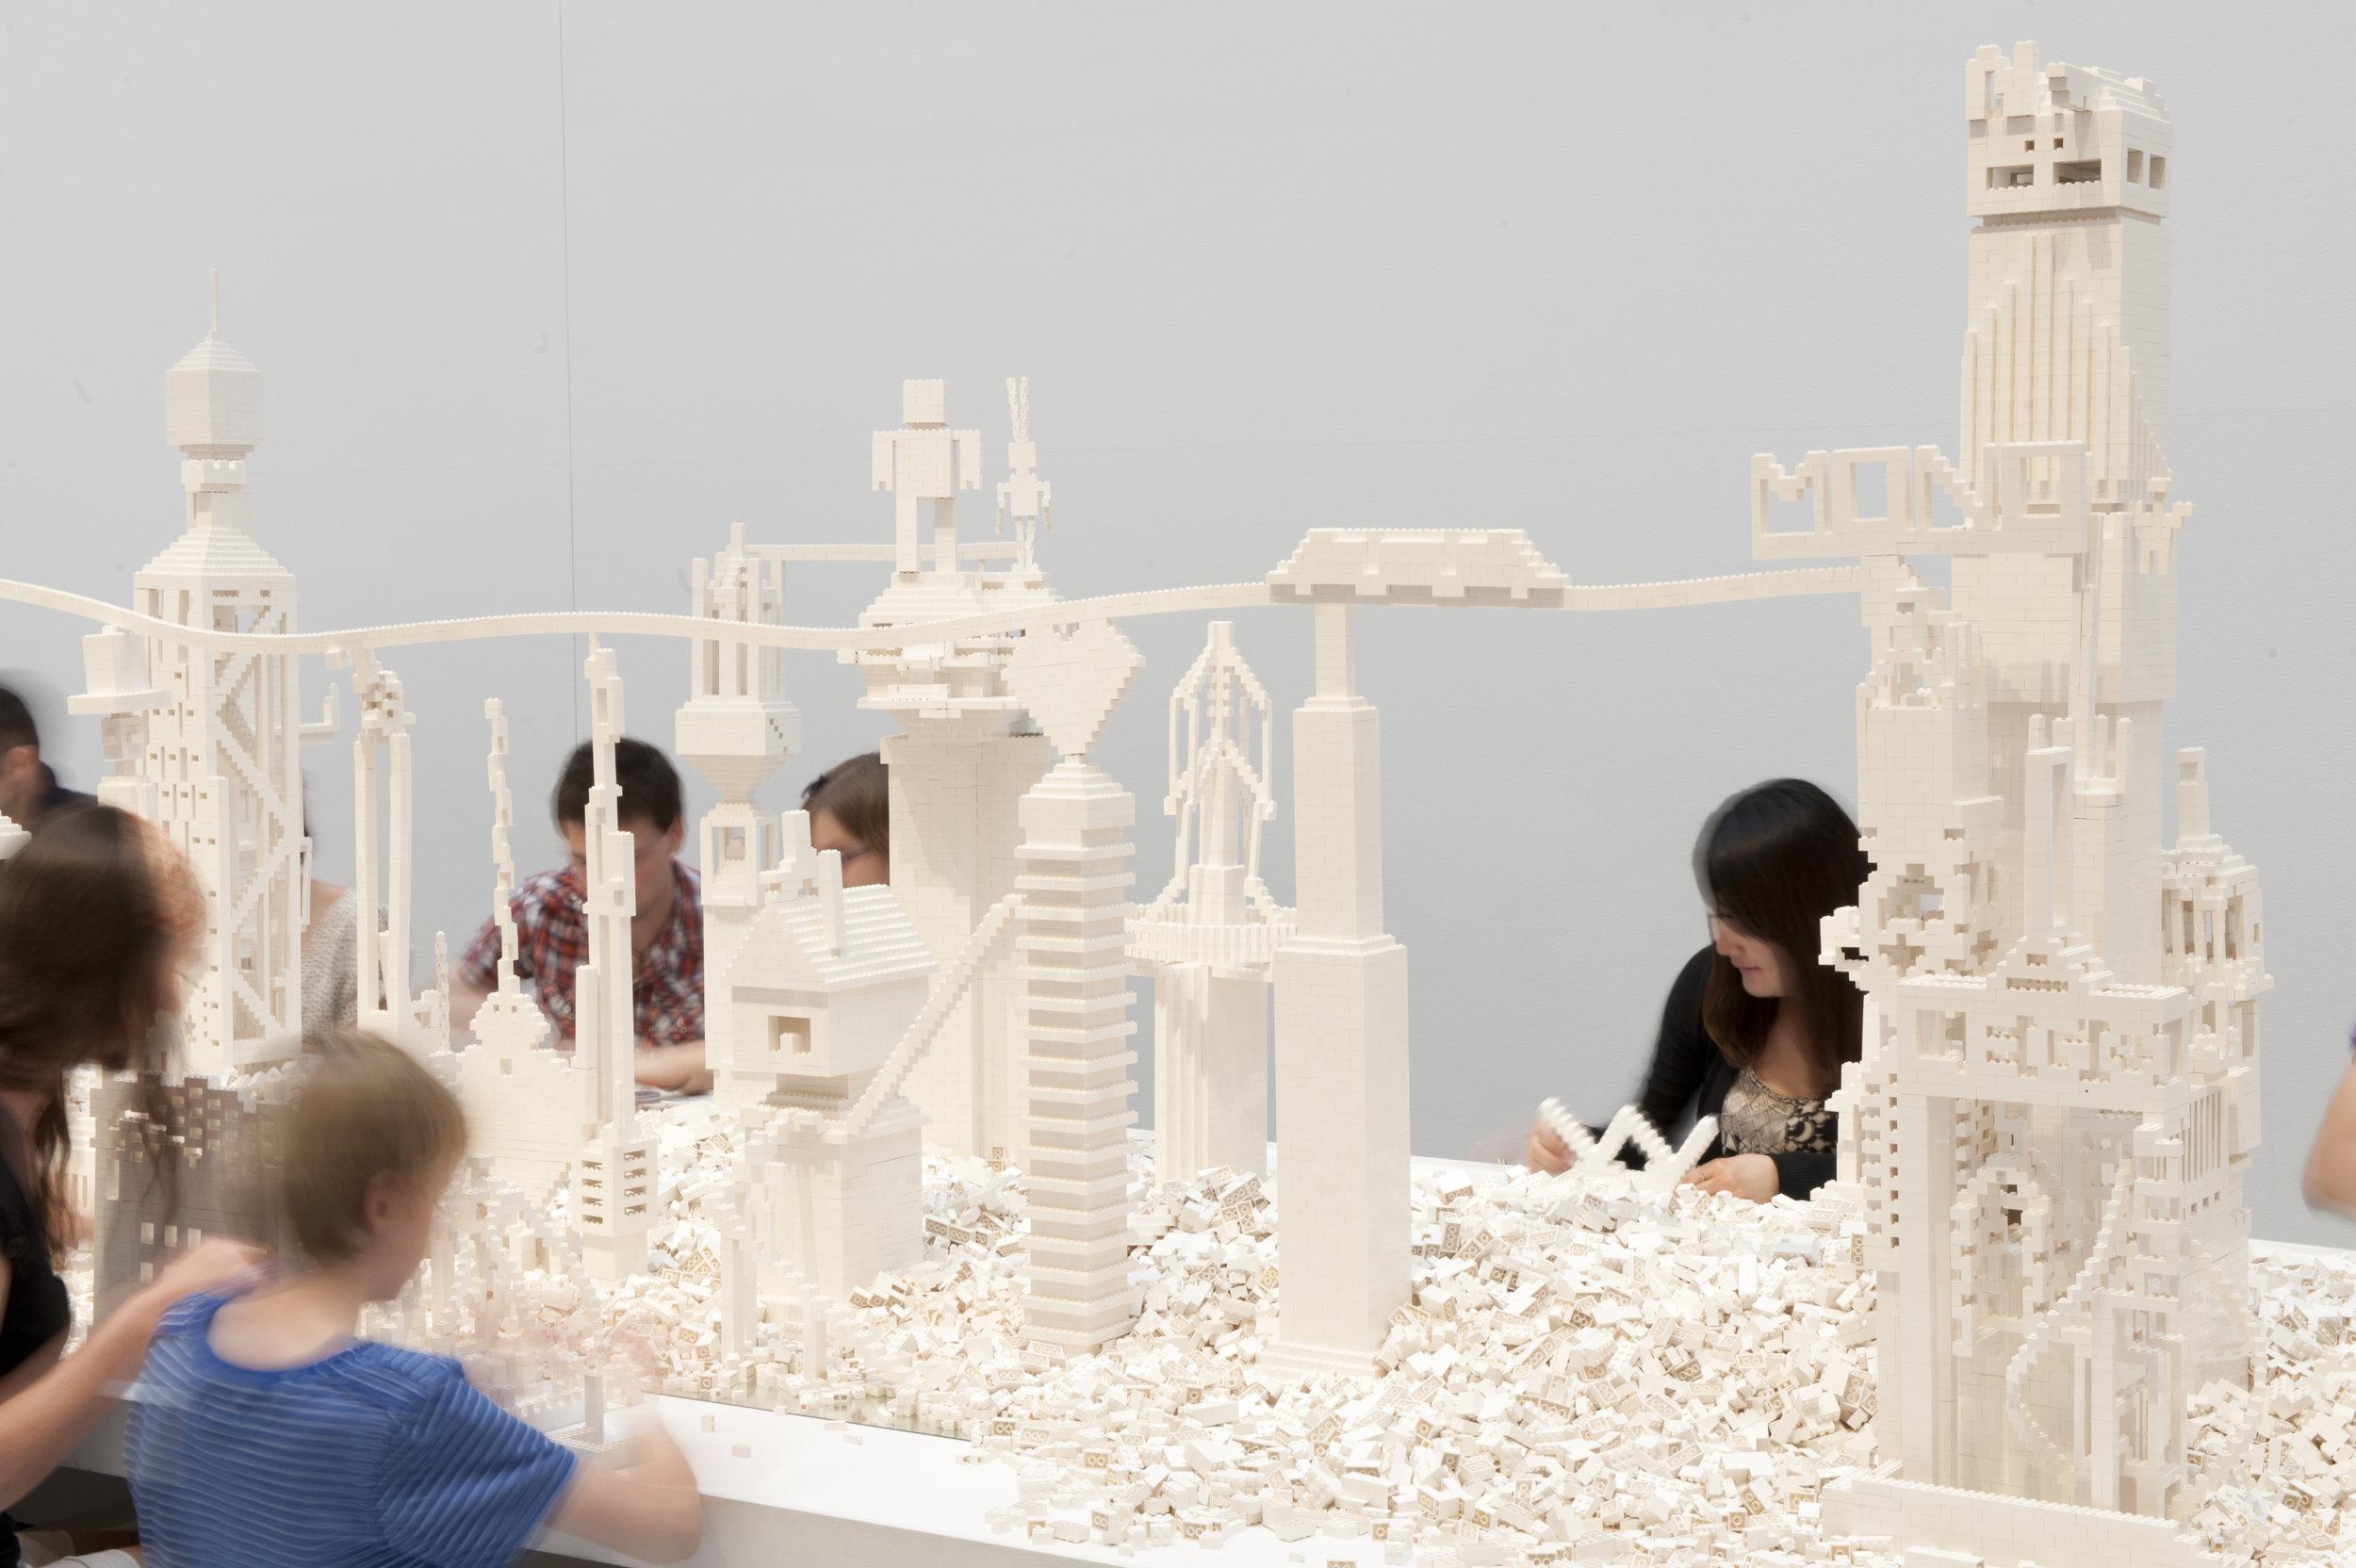 Olafur Eliasson (b.1967)   The cubic structural evolution project  2004 White LEGO bricks (various sizes), wood, mirror Installation view: QAGOMA Photo: Mark Sherwood, QAGOMA © 2004 Olafur Eliasson